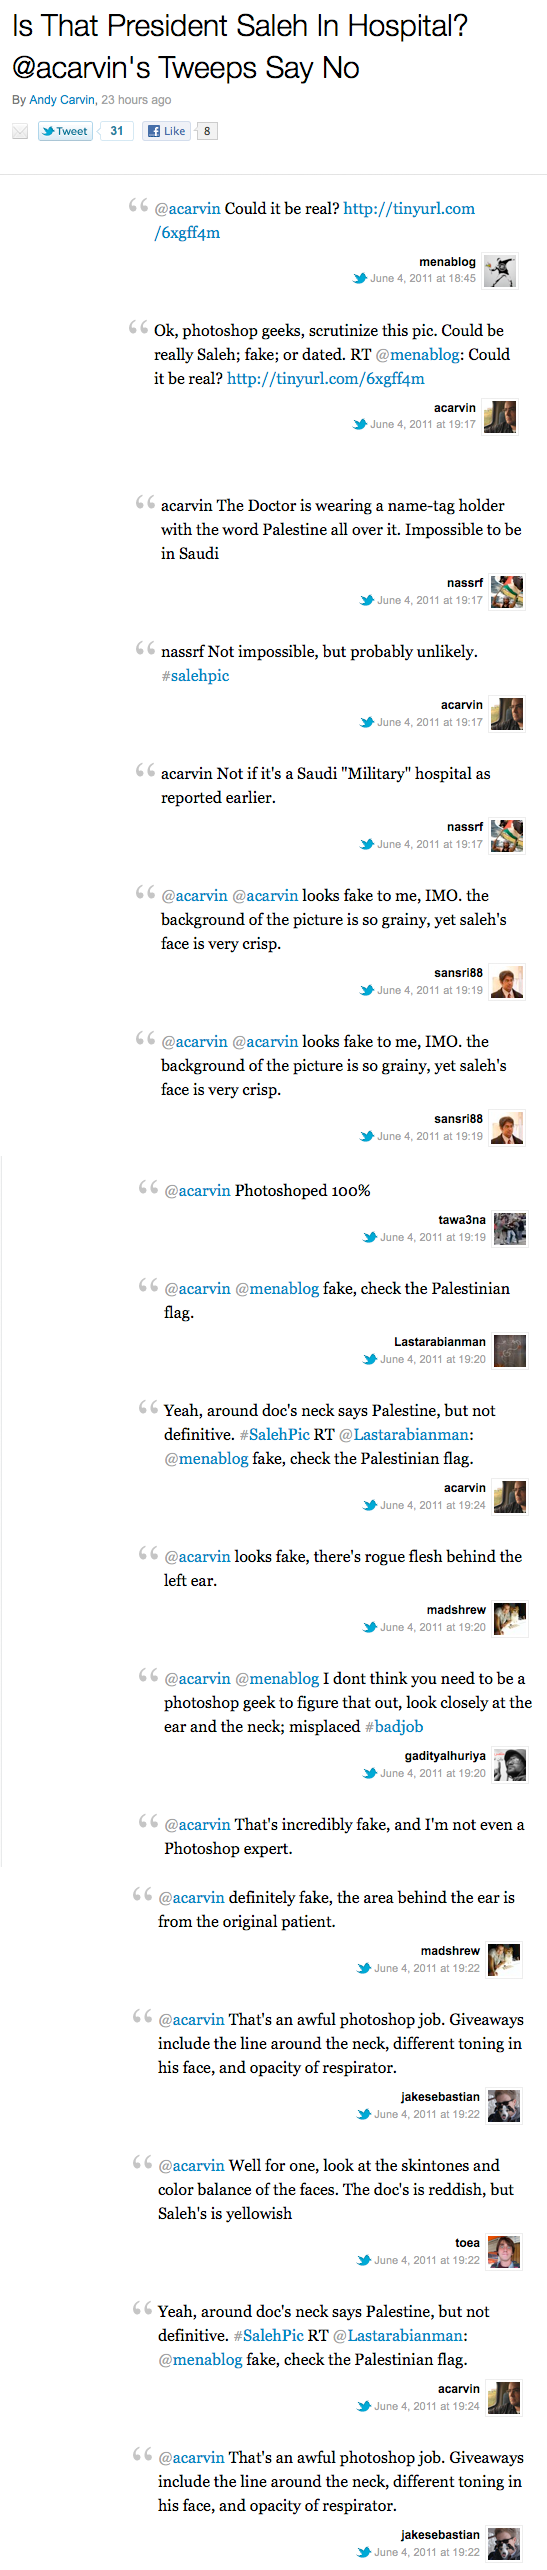 Photofake tweets